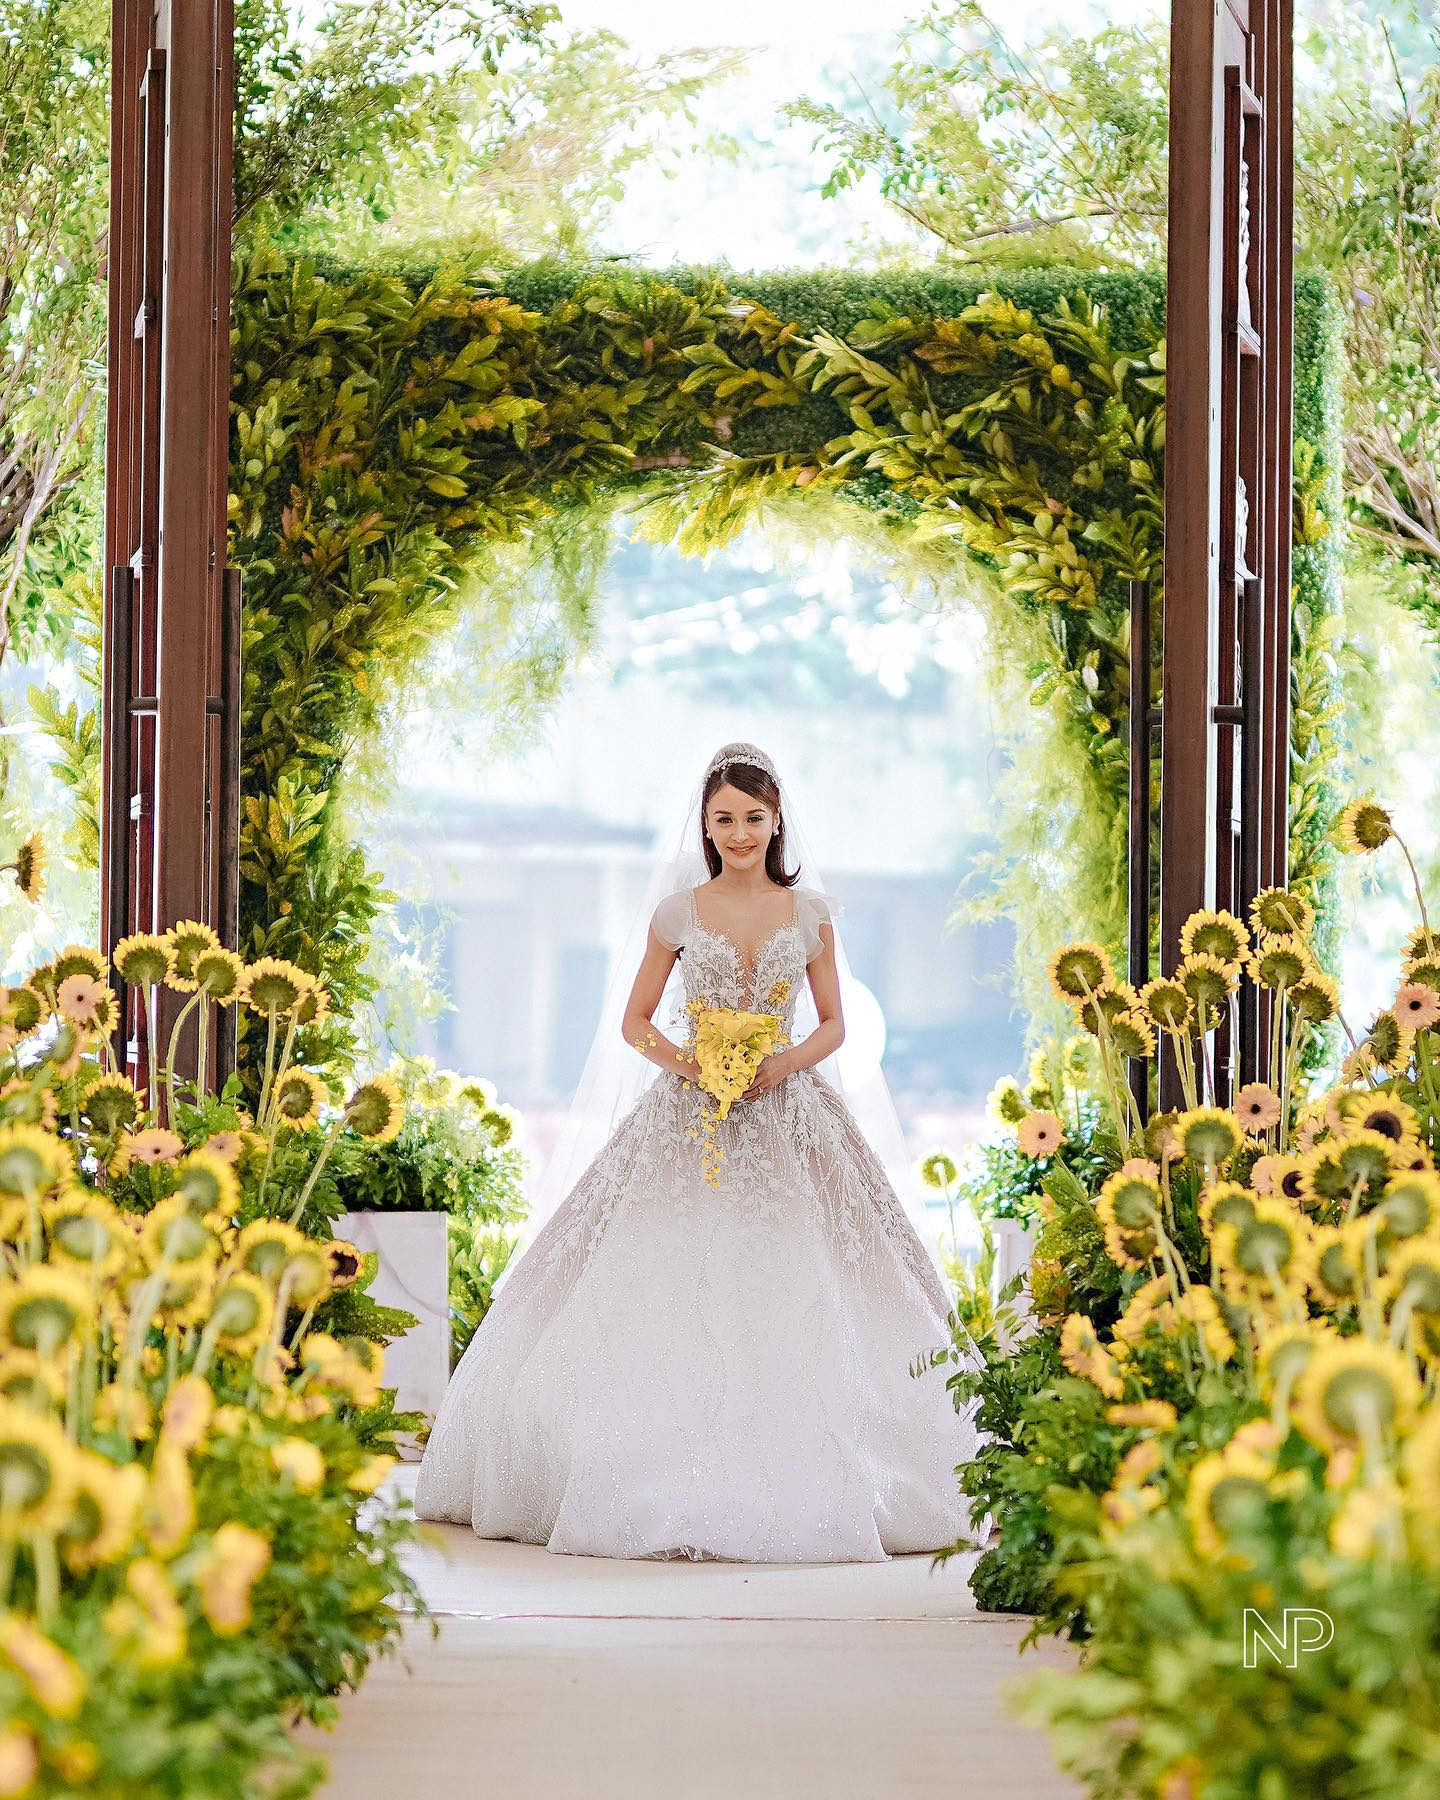 kris bernal's gideon hermosa wedding flowers